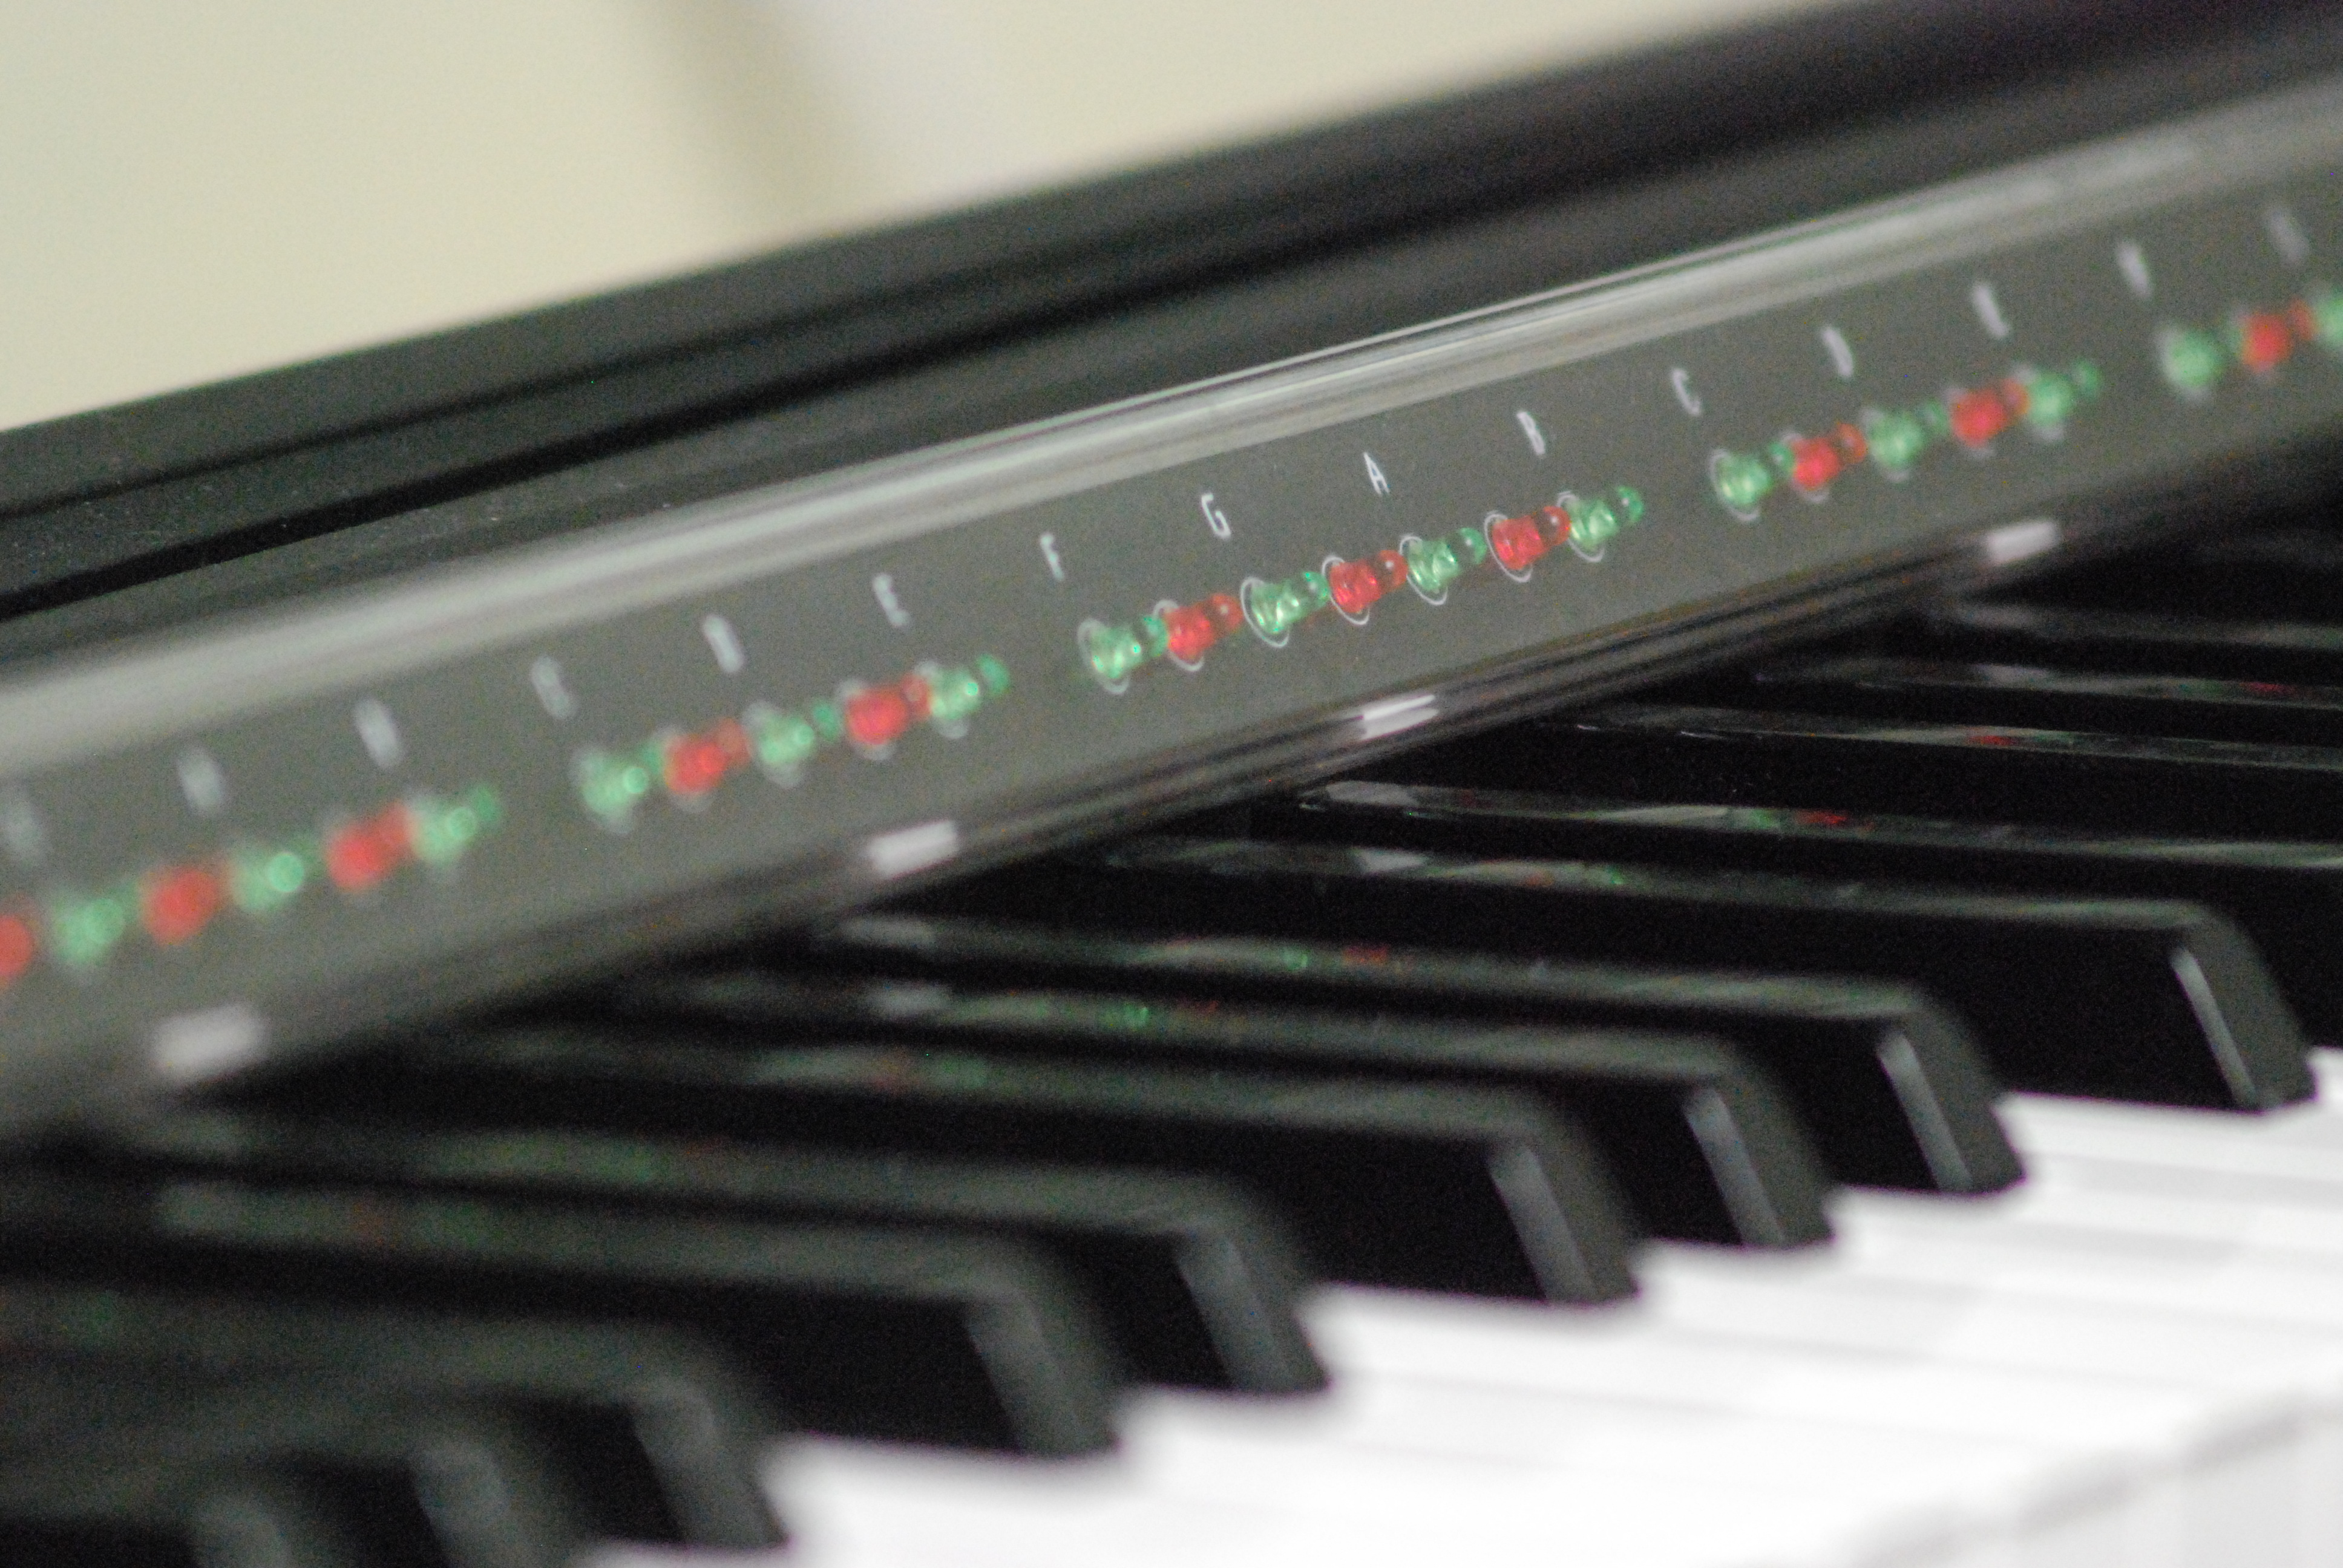 PianoMaestro guides pianists through the music